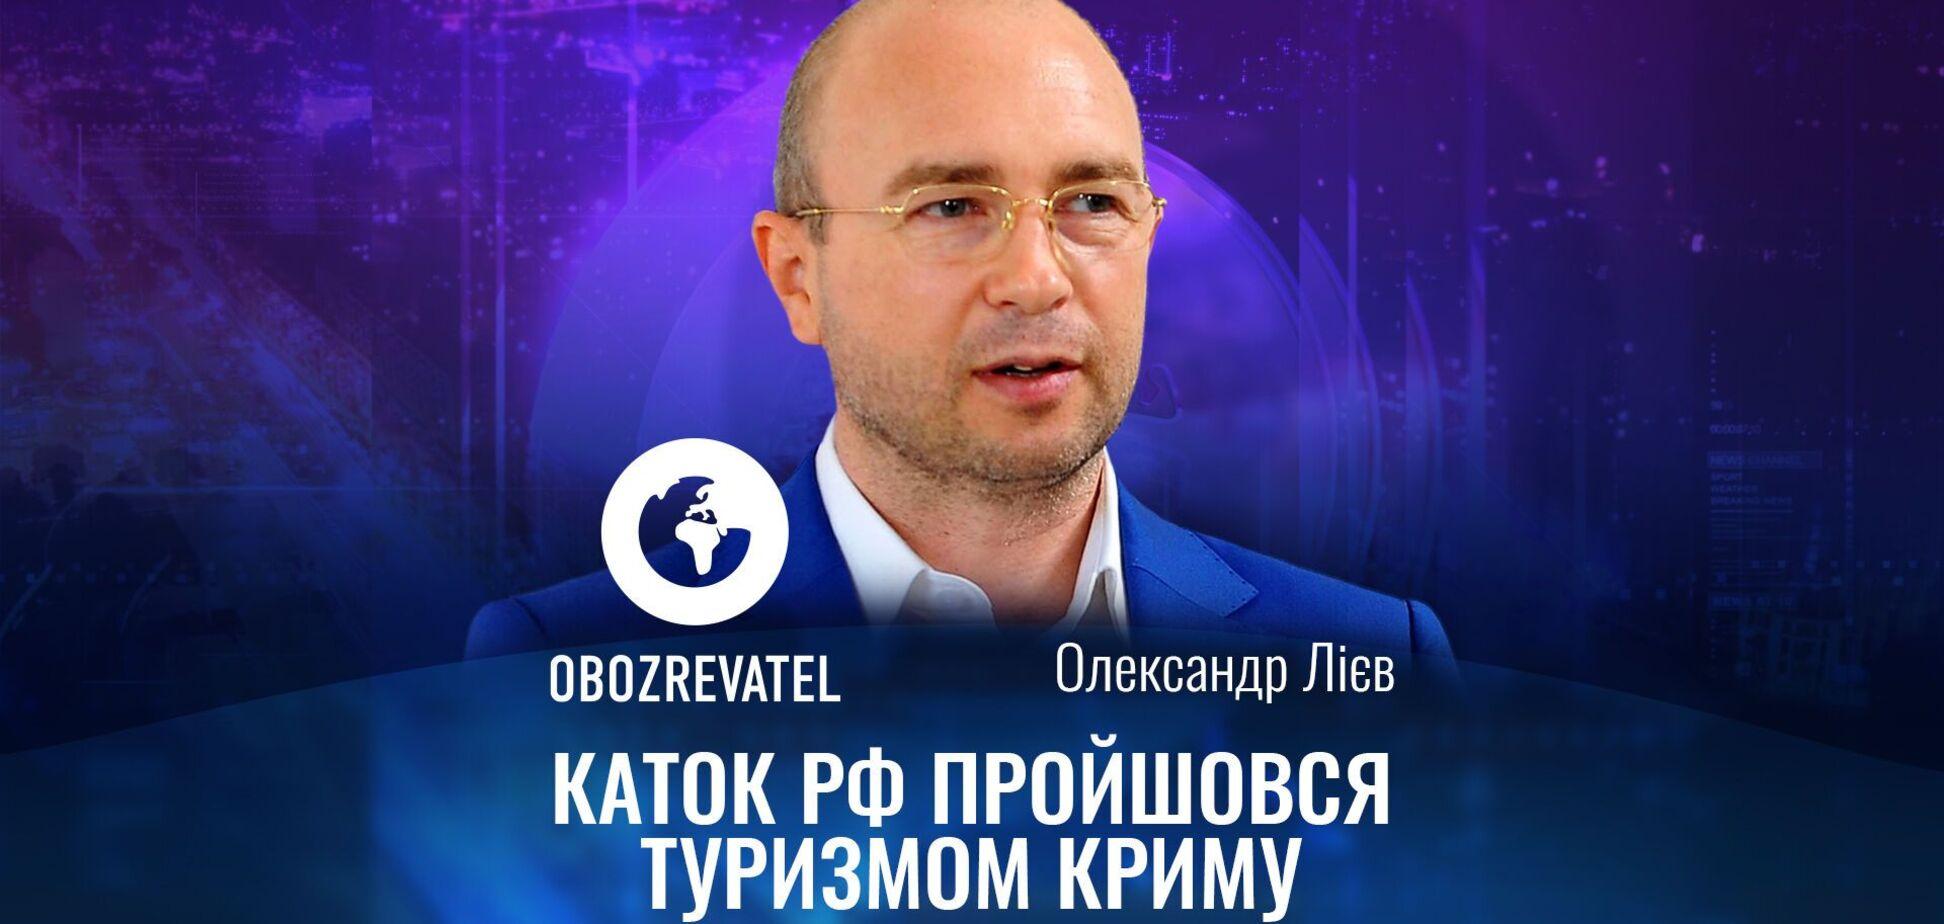 Александр Лиев: по туризму Крыма прошелся каток РФ